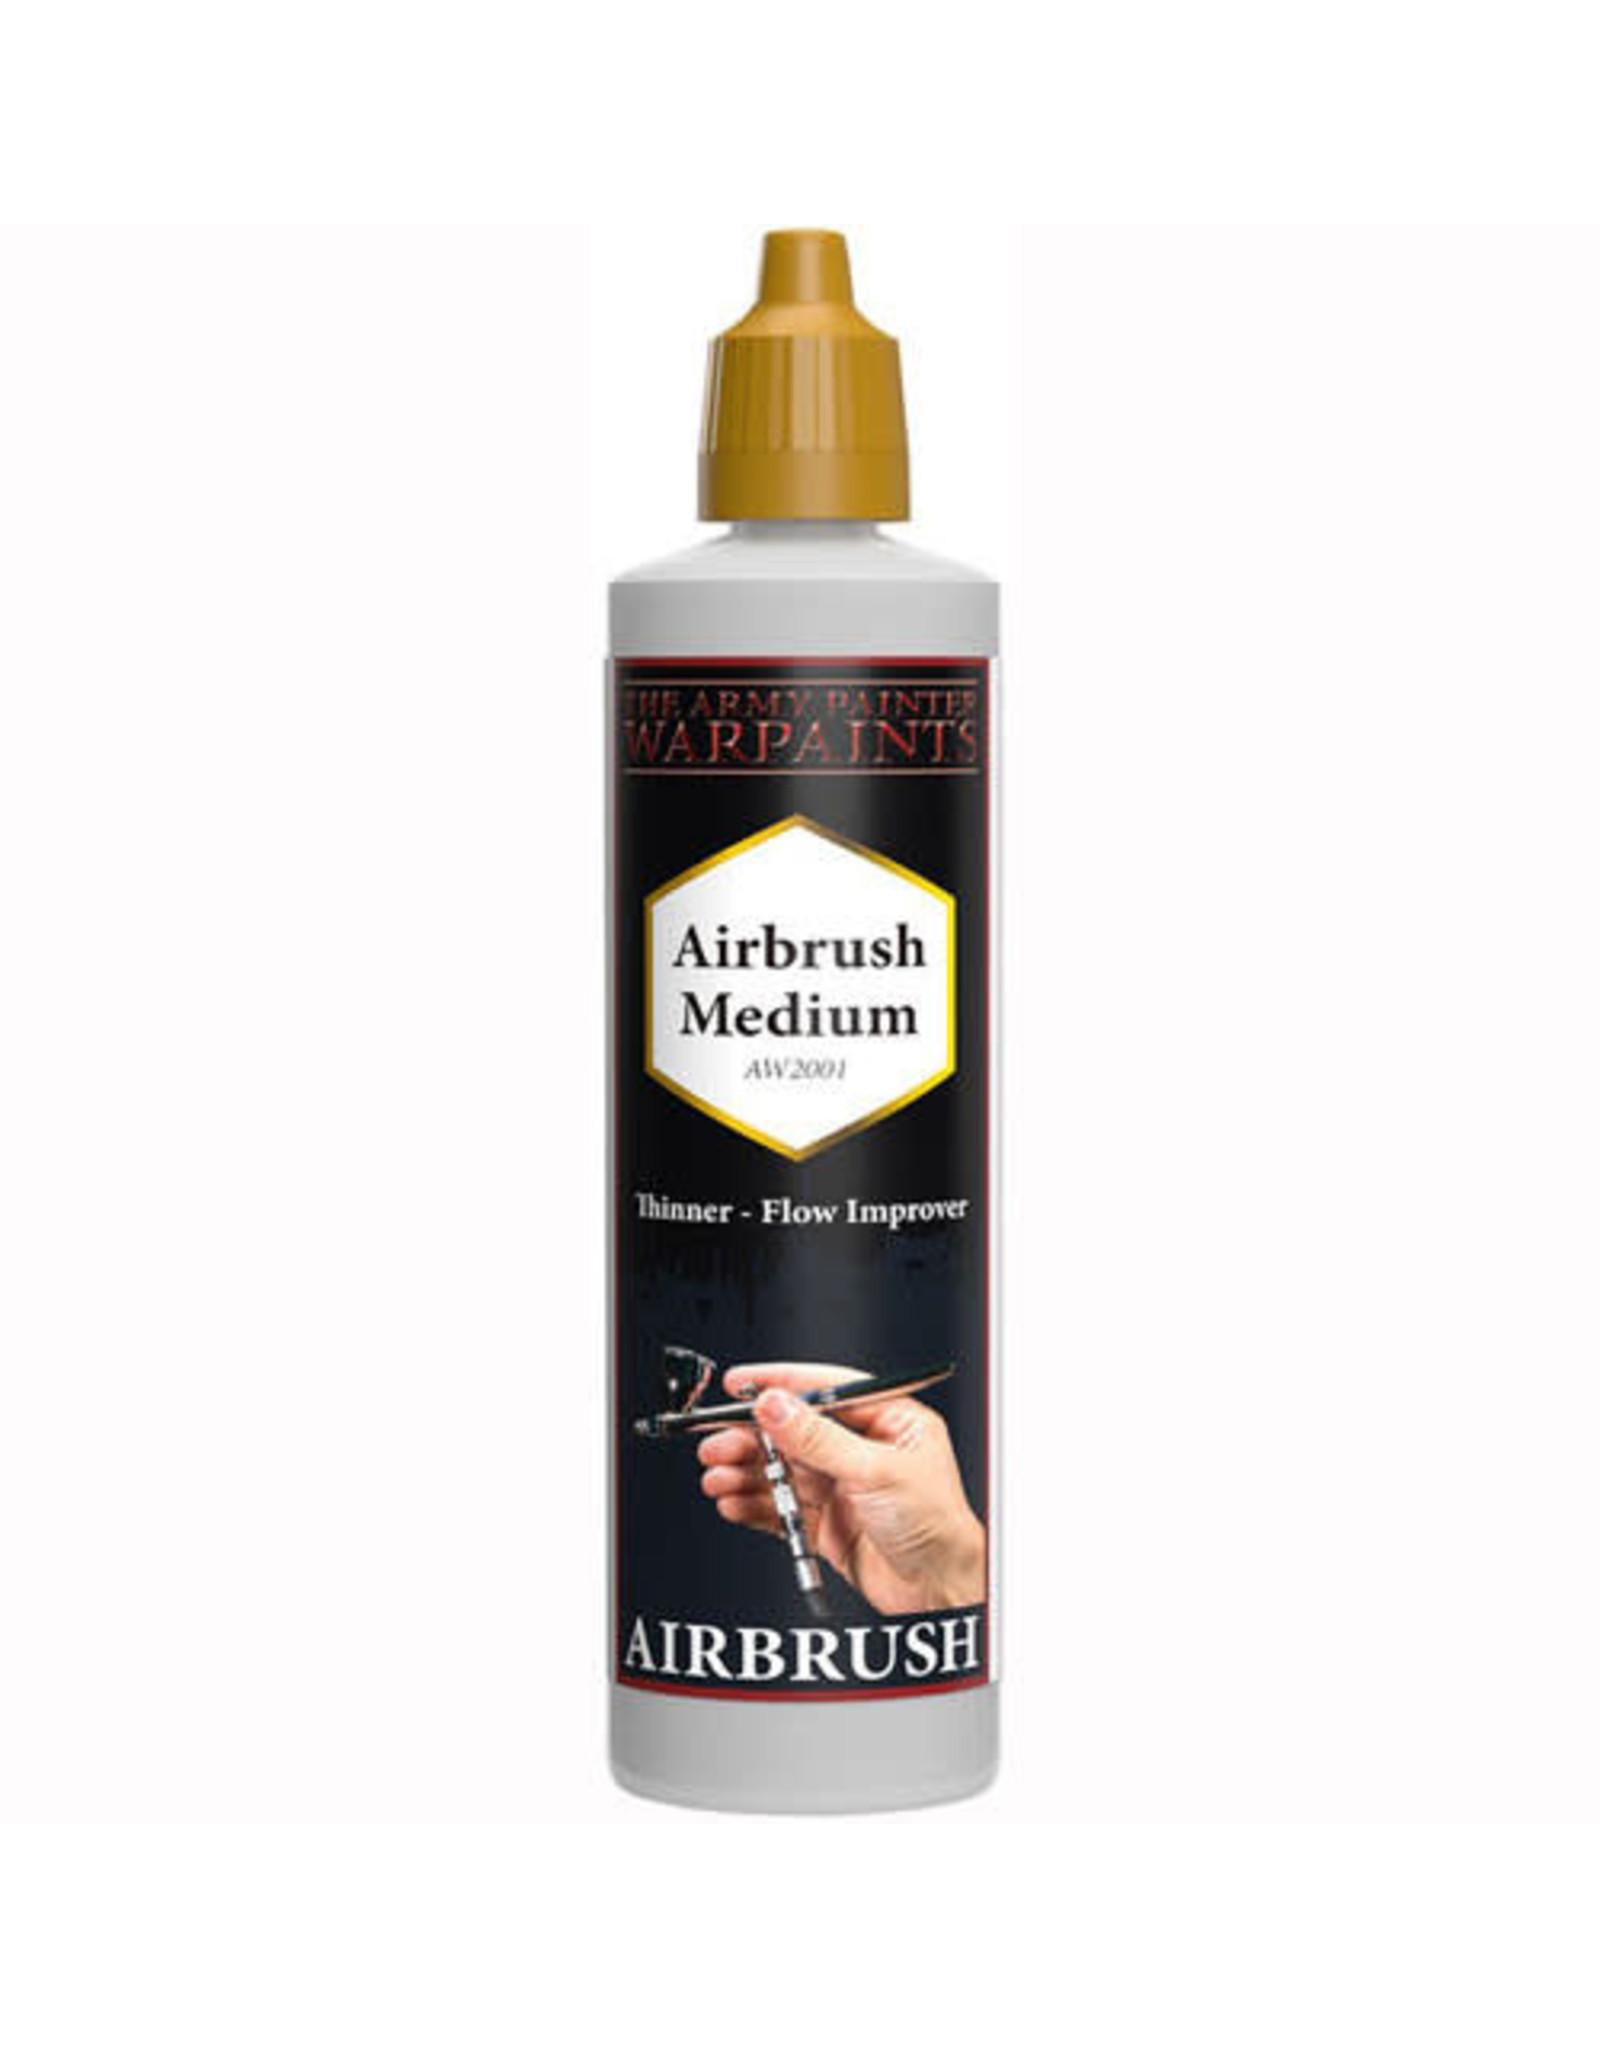 TAP Airbrush Medium: Thinner - Flow Improver (100ml)